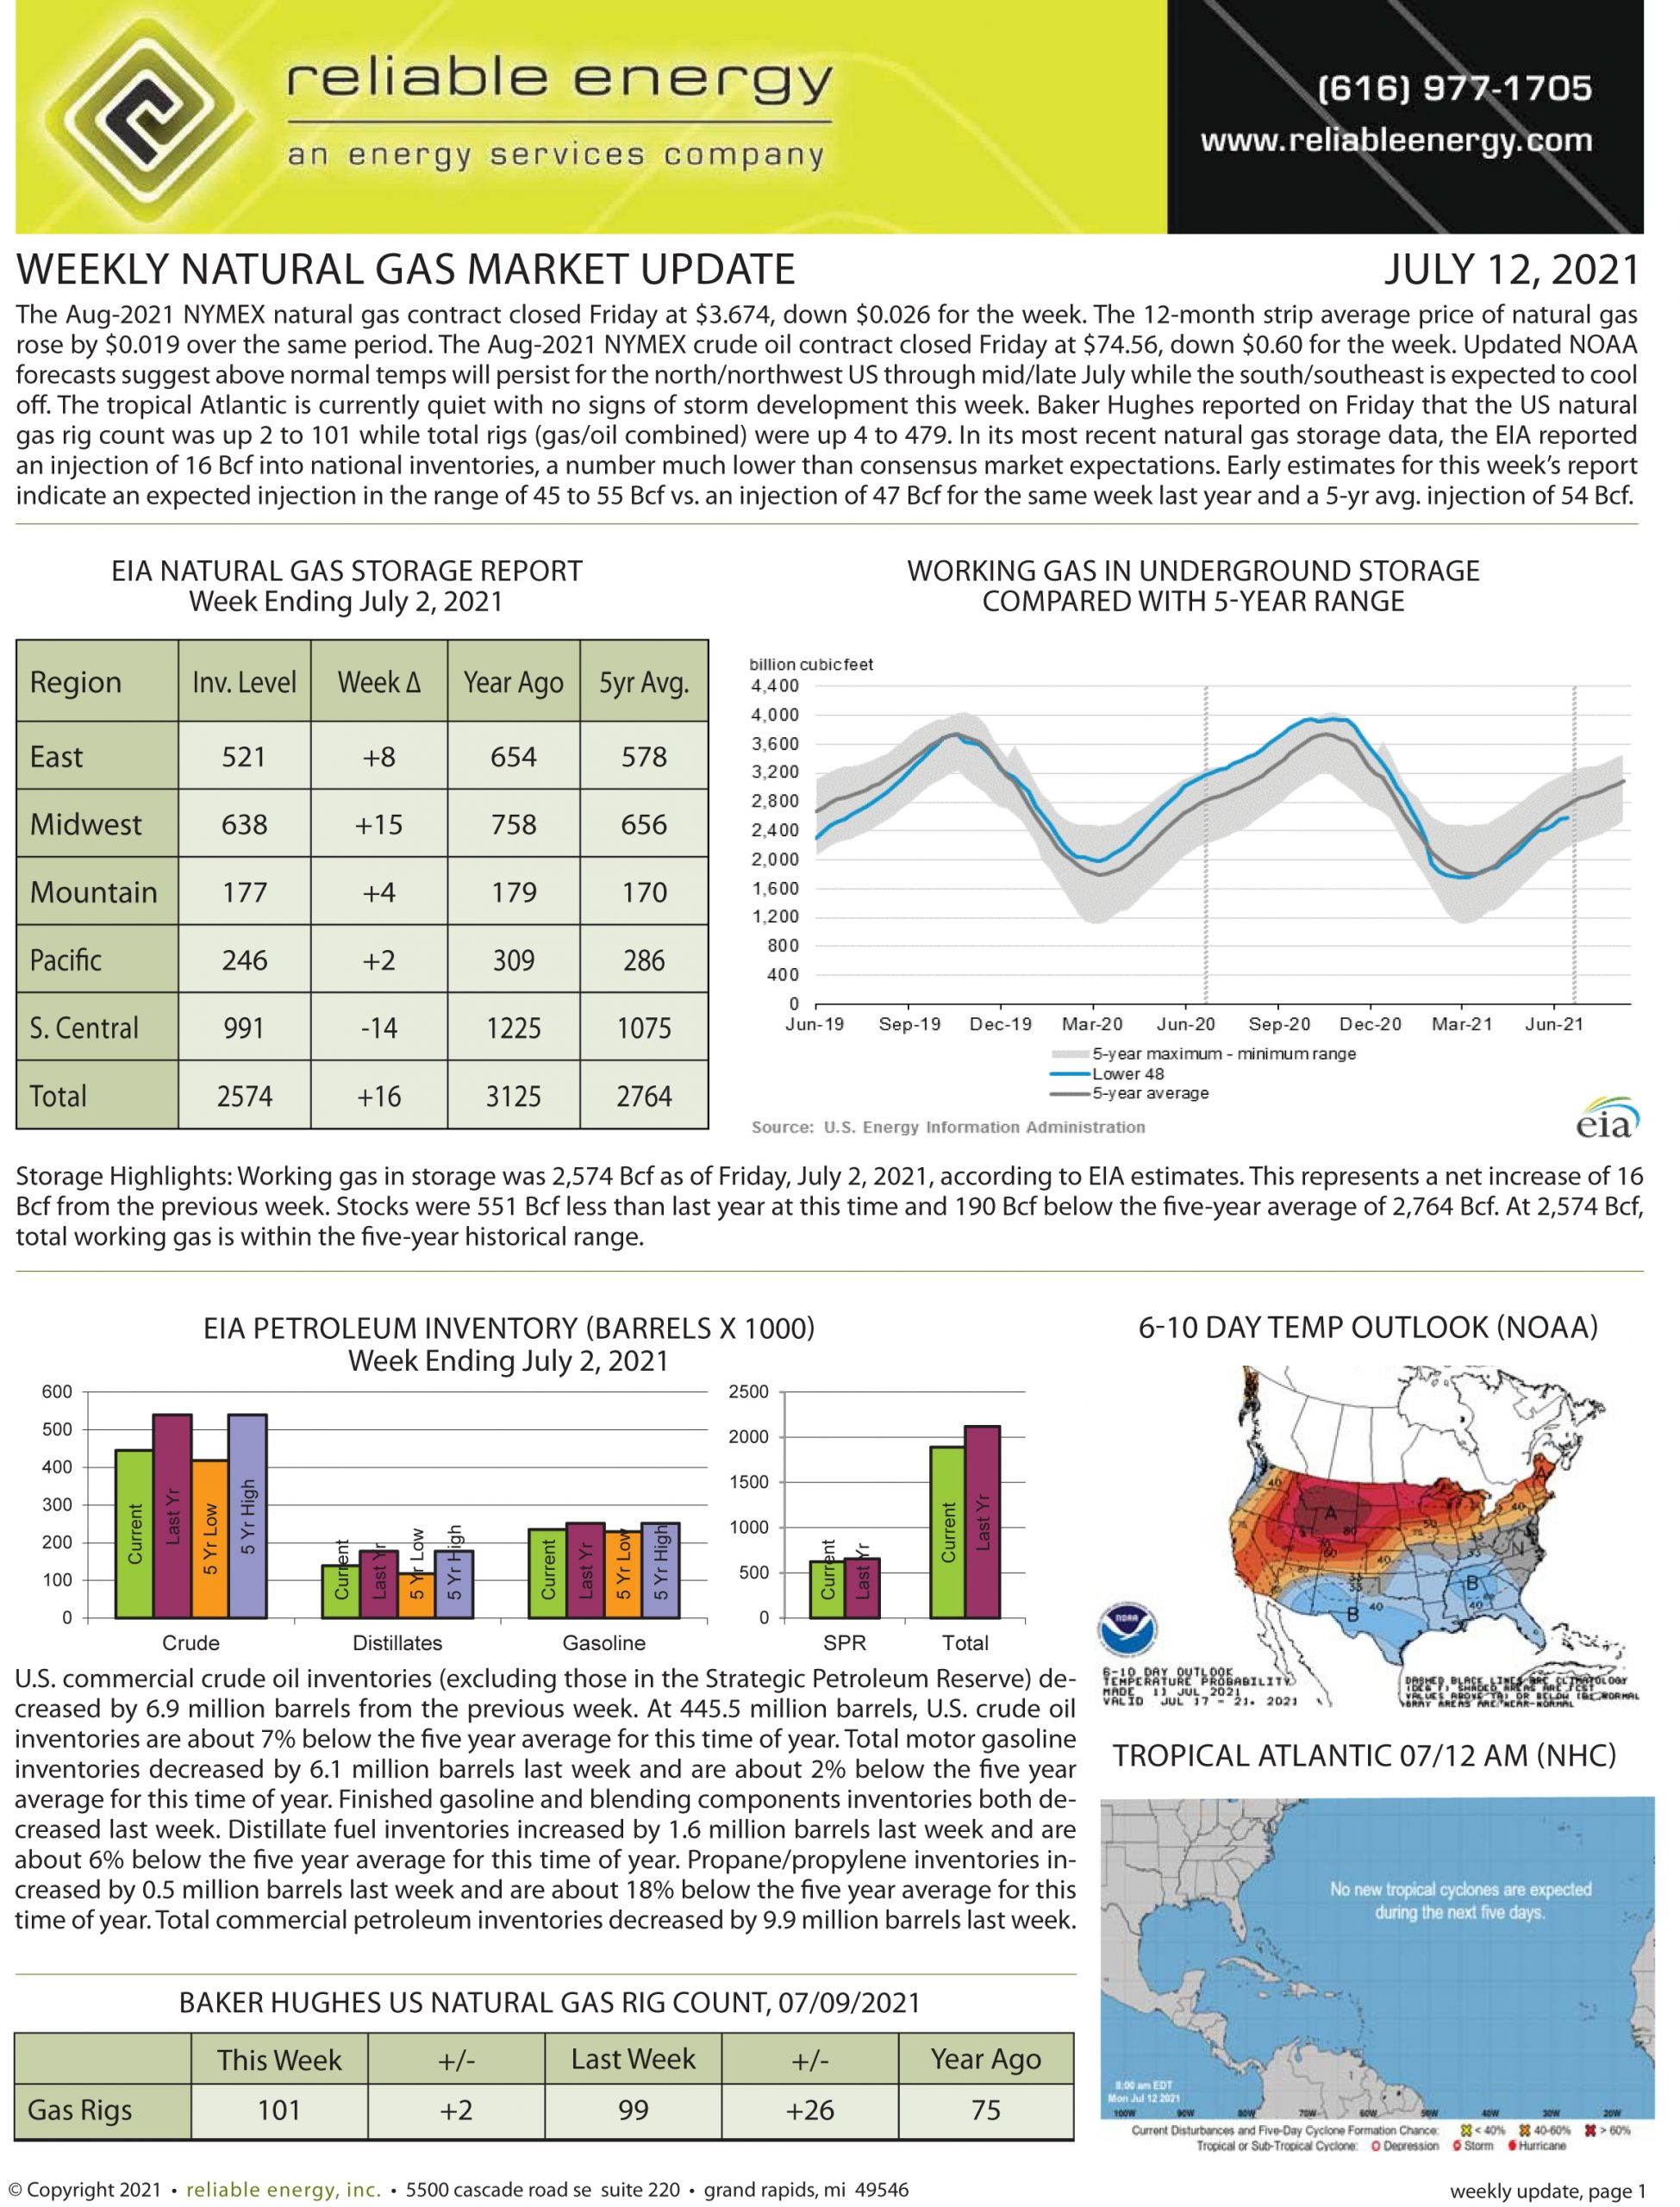 Natural Gas Market Update – July 12, 2021